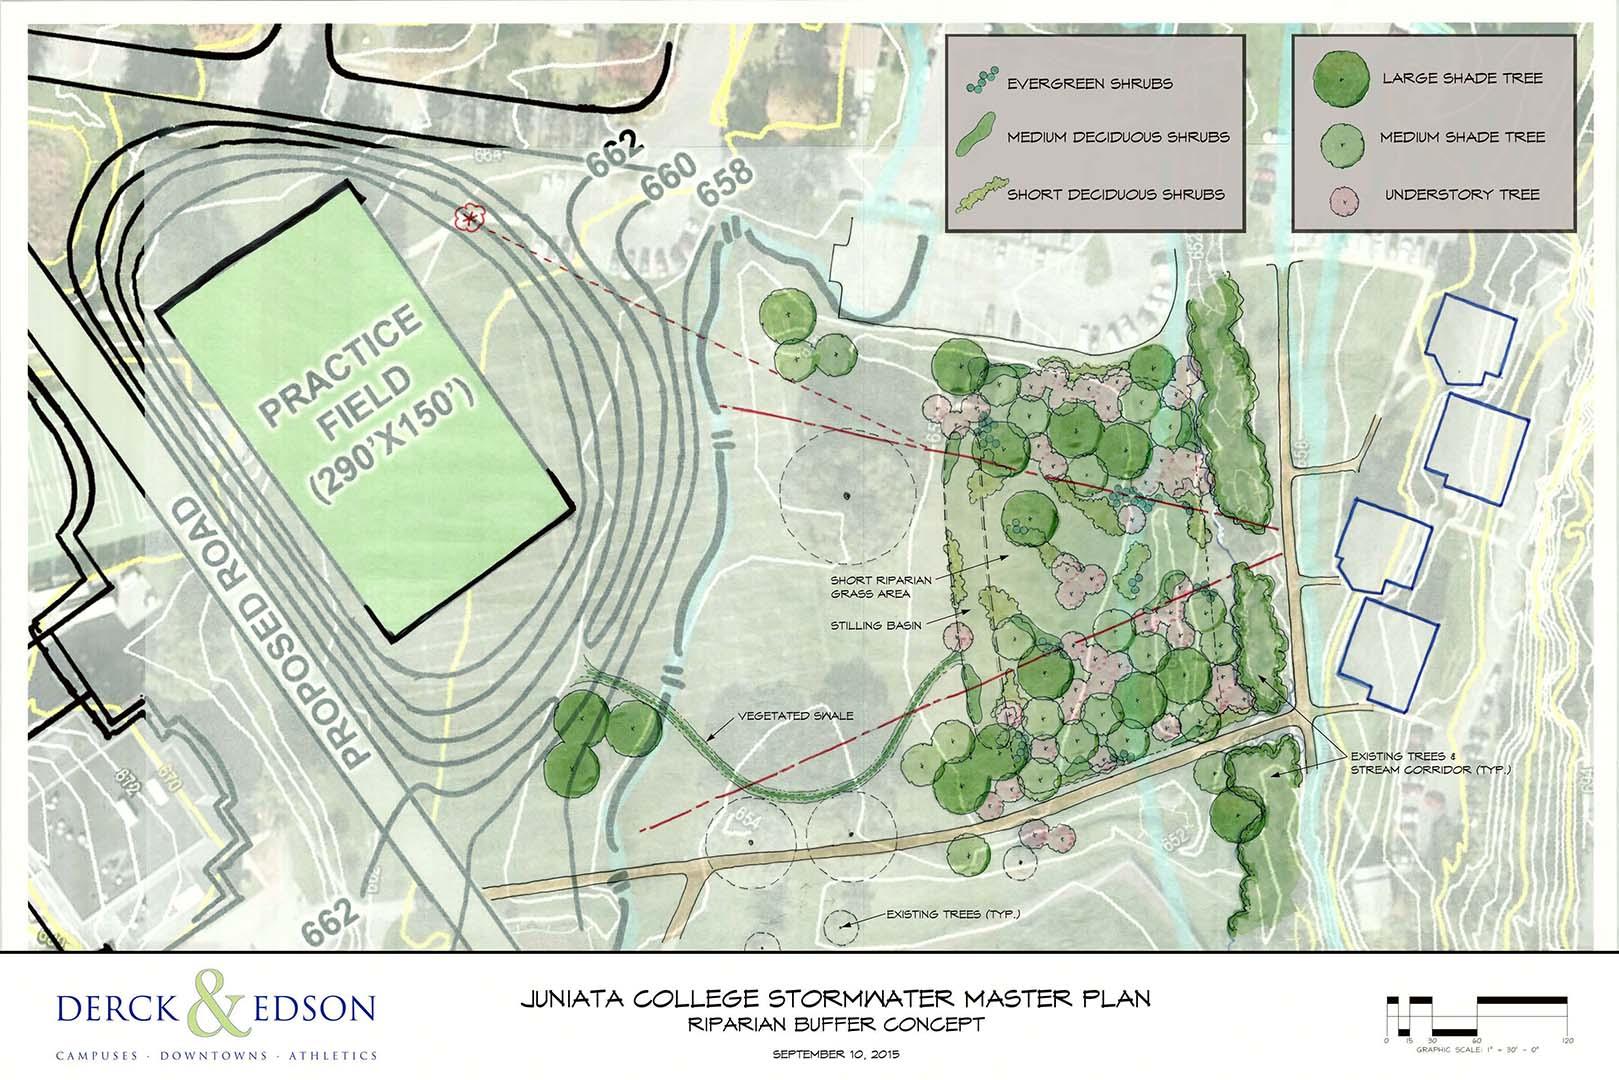 Juniata Campus Map.Juniata College Storm Water Planning Derck Edson